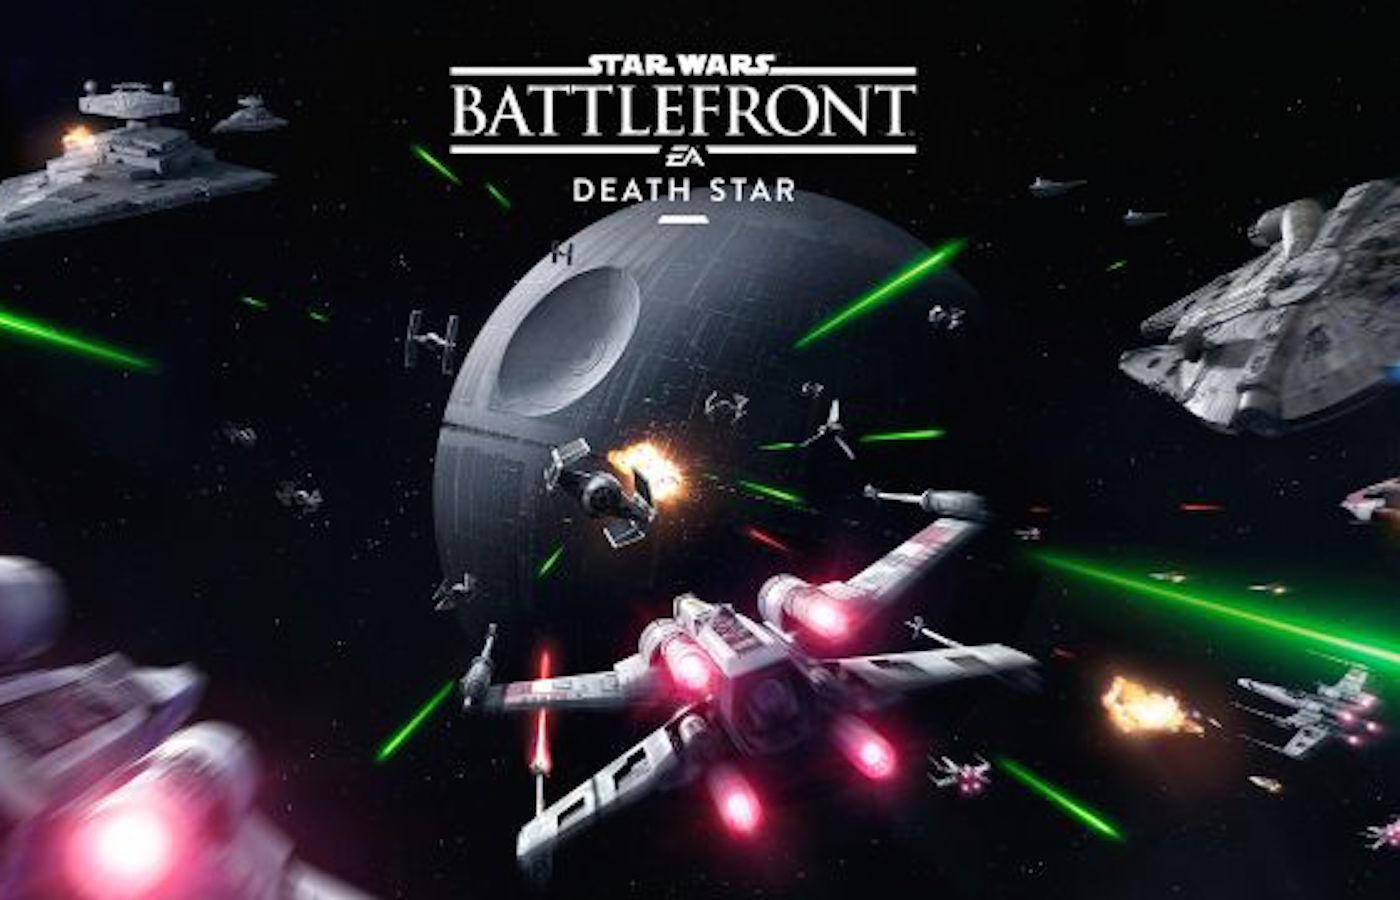 battlefrontdeathstar2.jpg